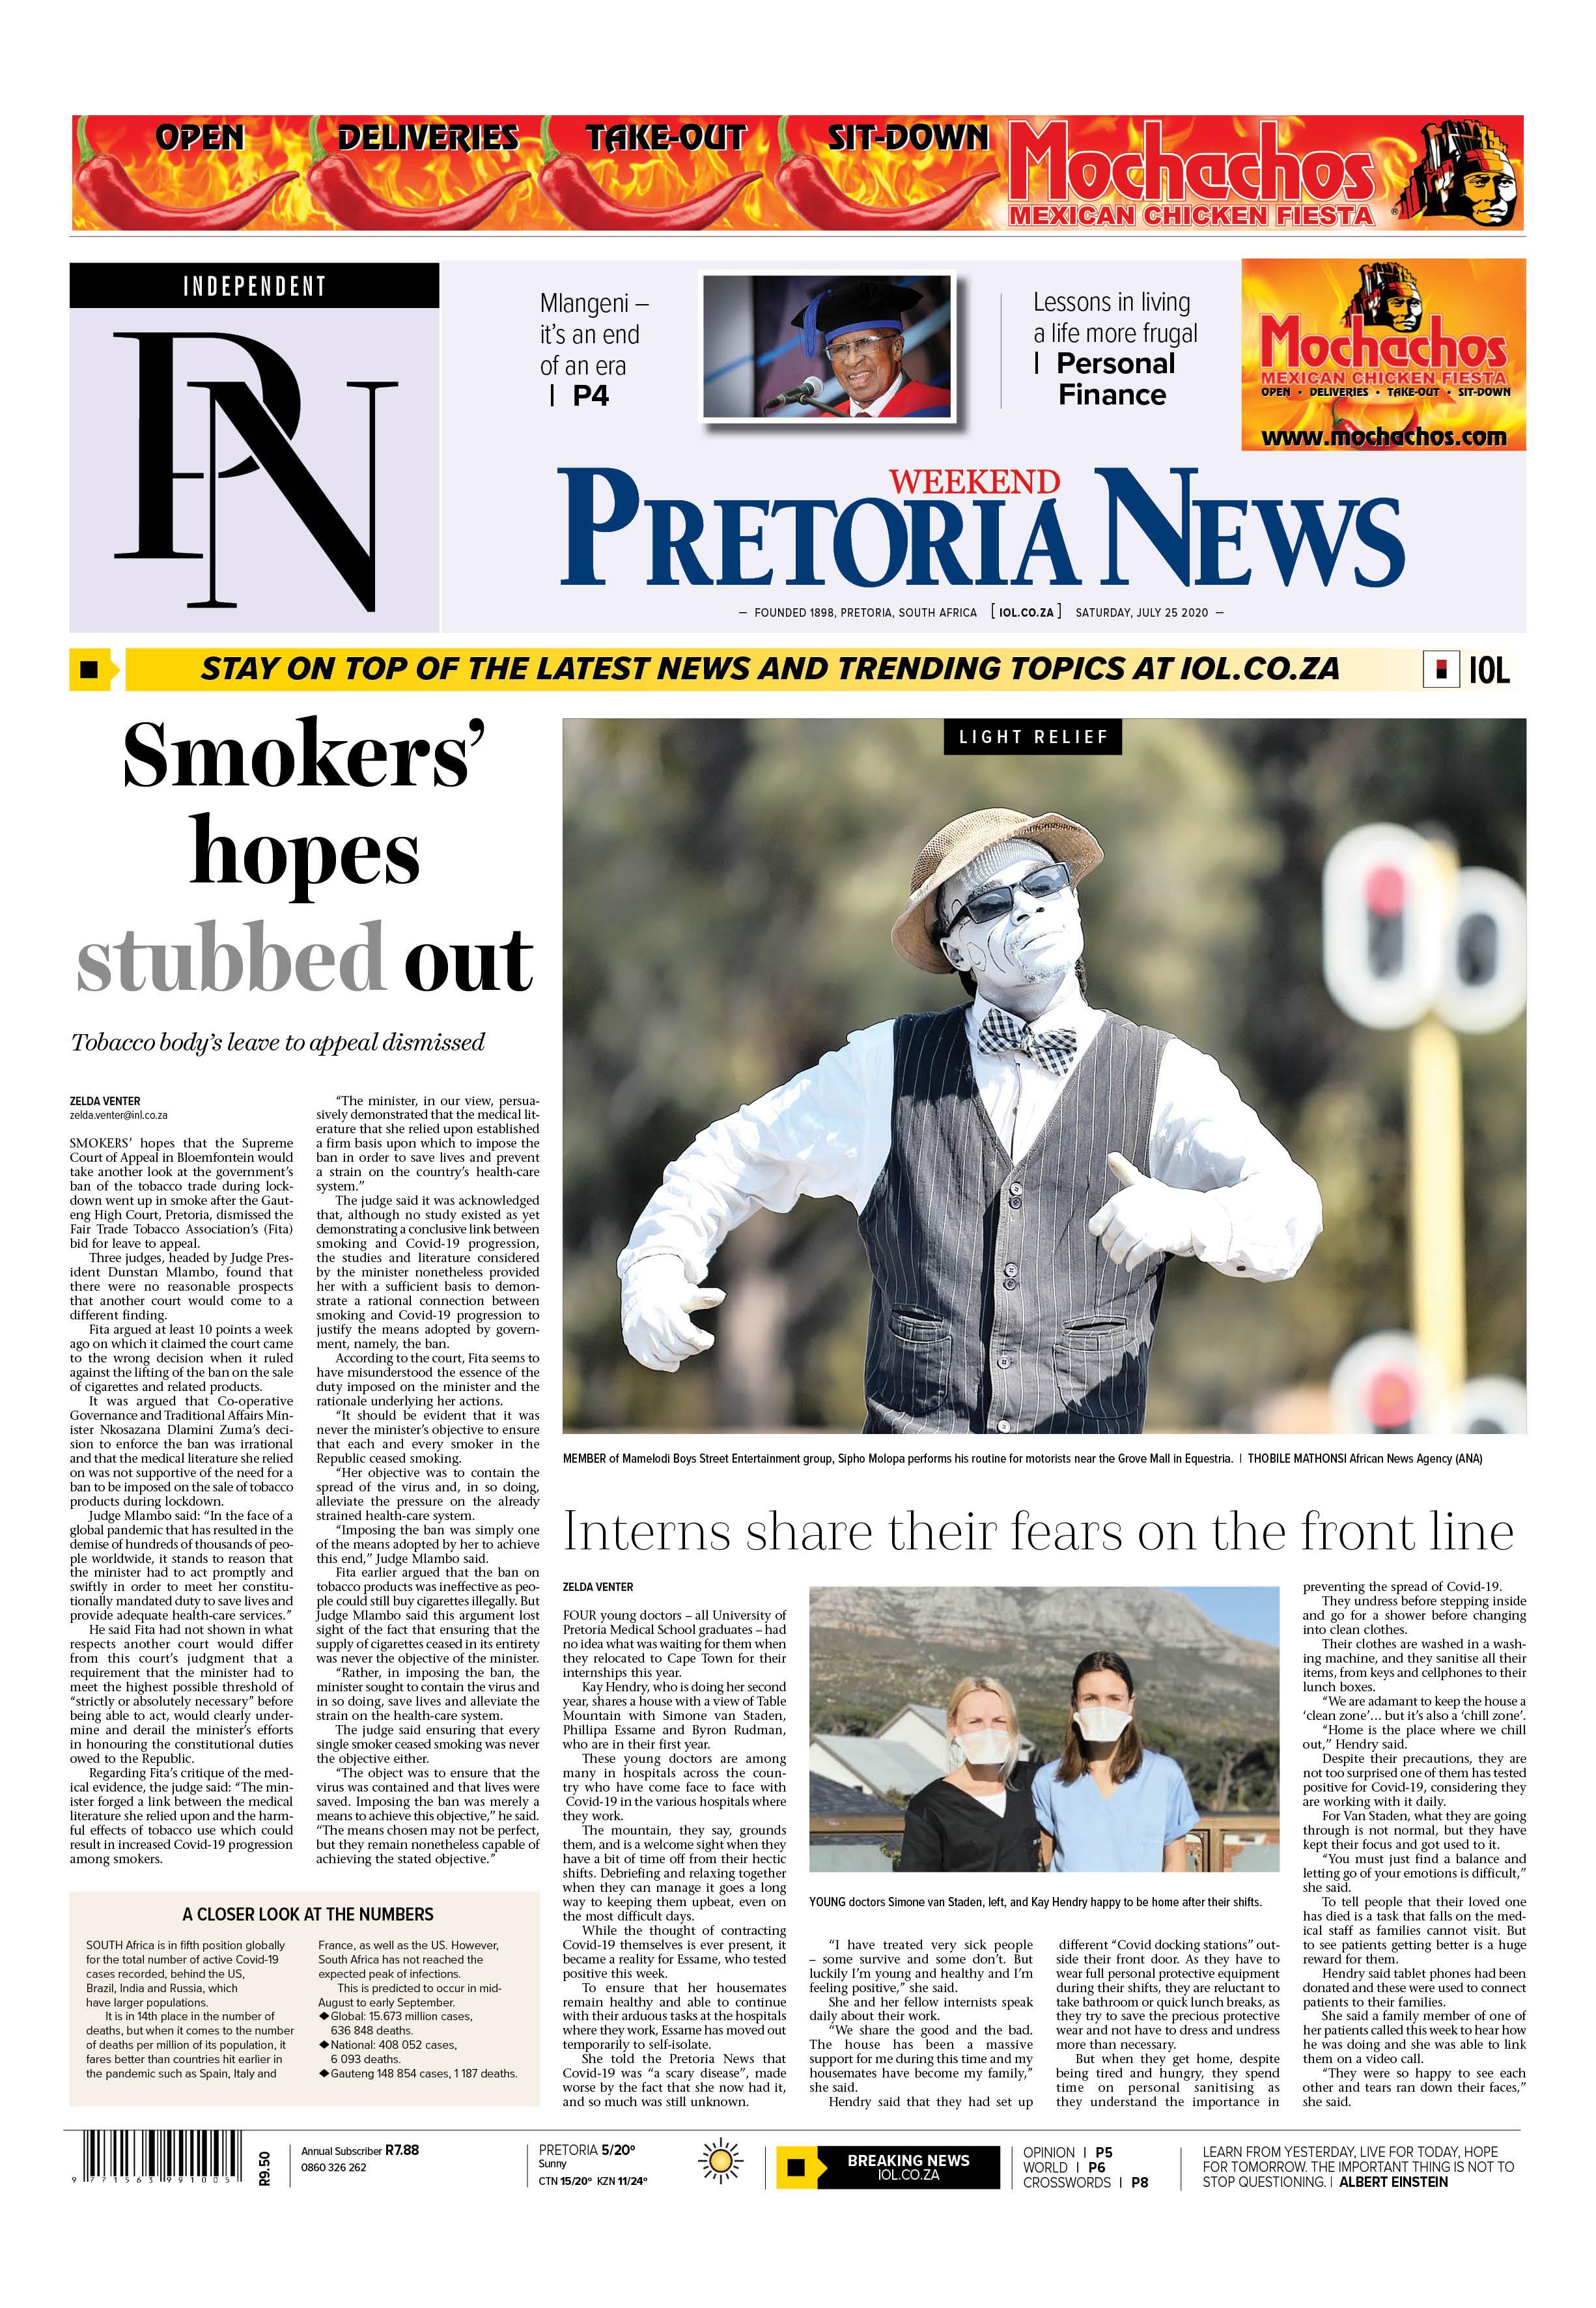 Pretoria News Weekend July 25 2020